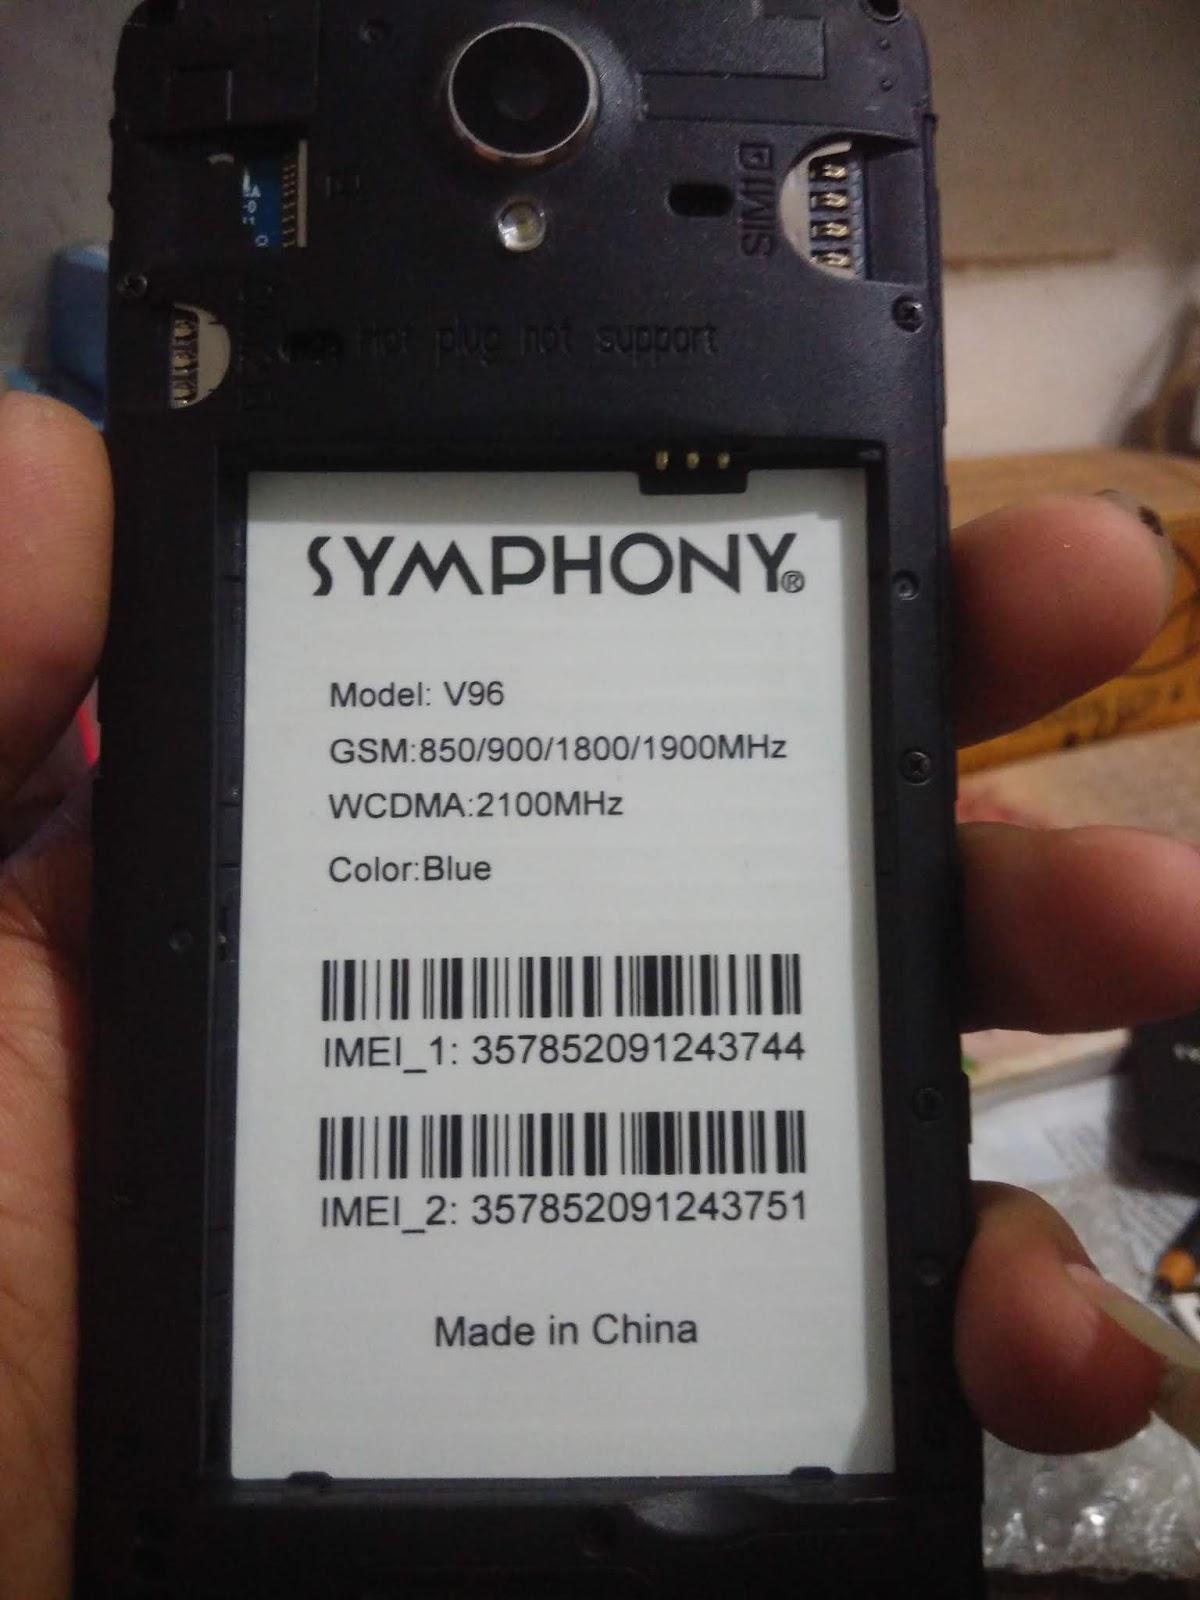 ALO TELECOM DHAKA BANGLADESH: Symphony V96 Hw2 Flash File Fastboot